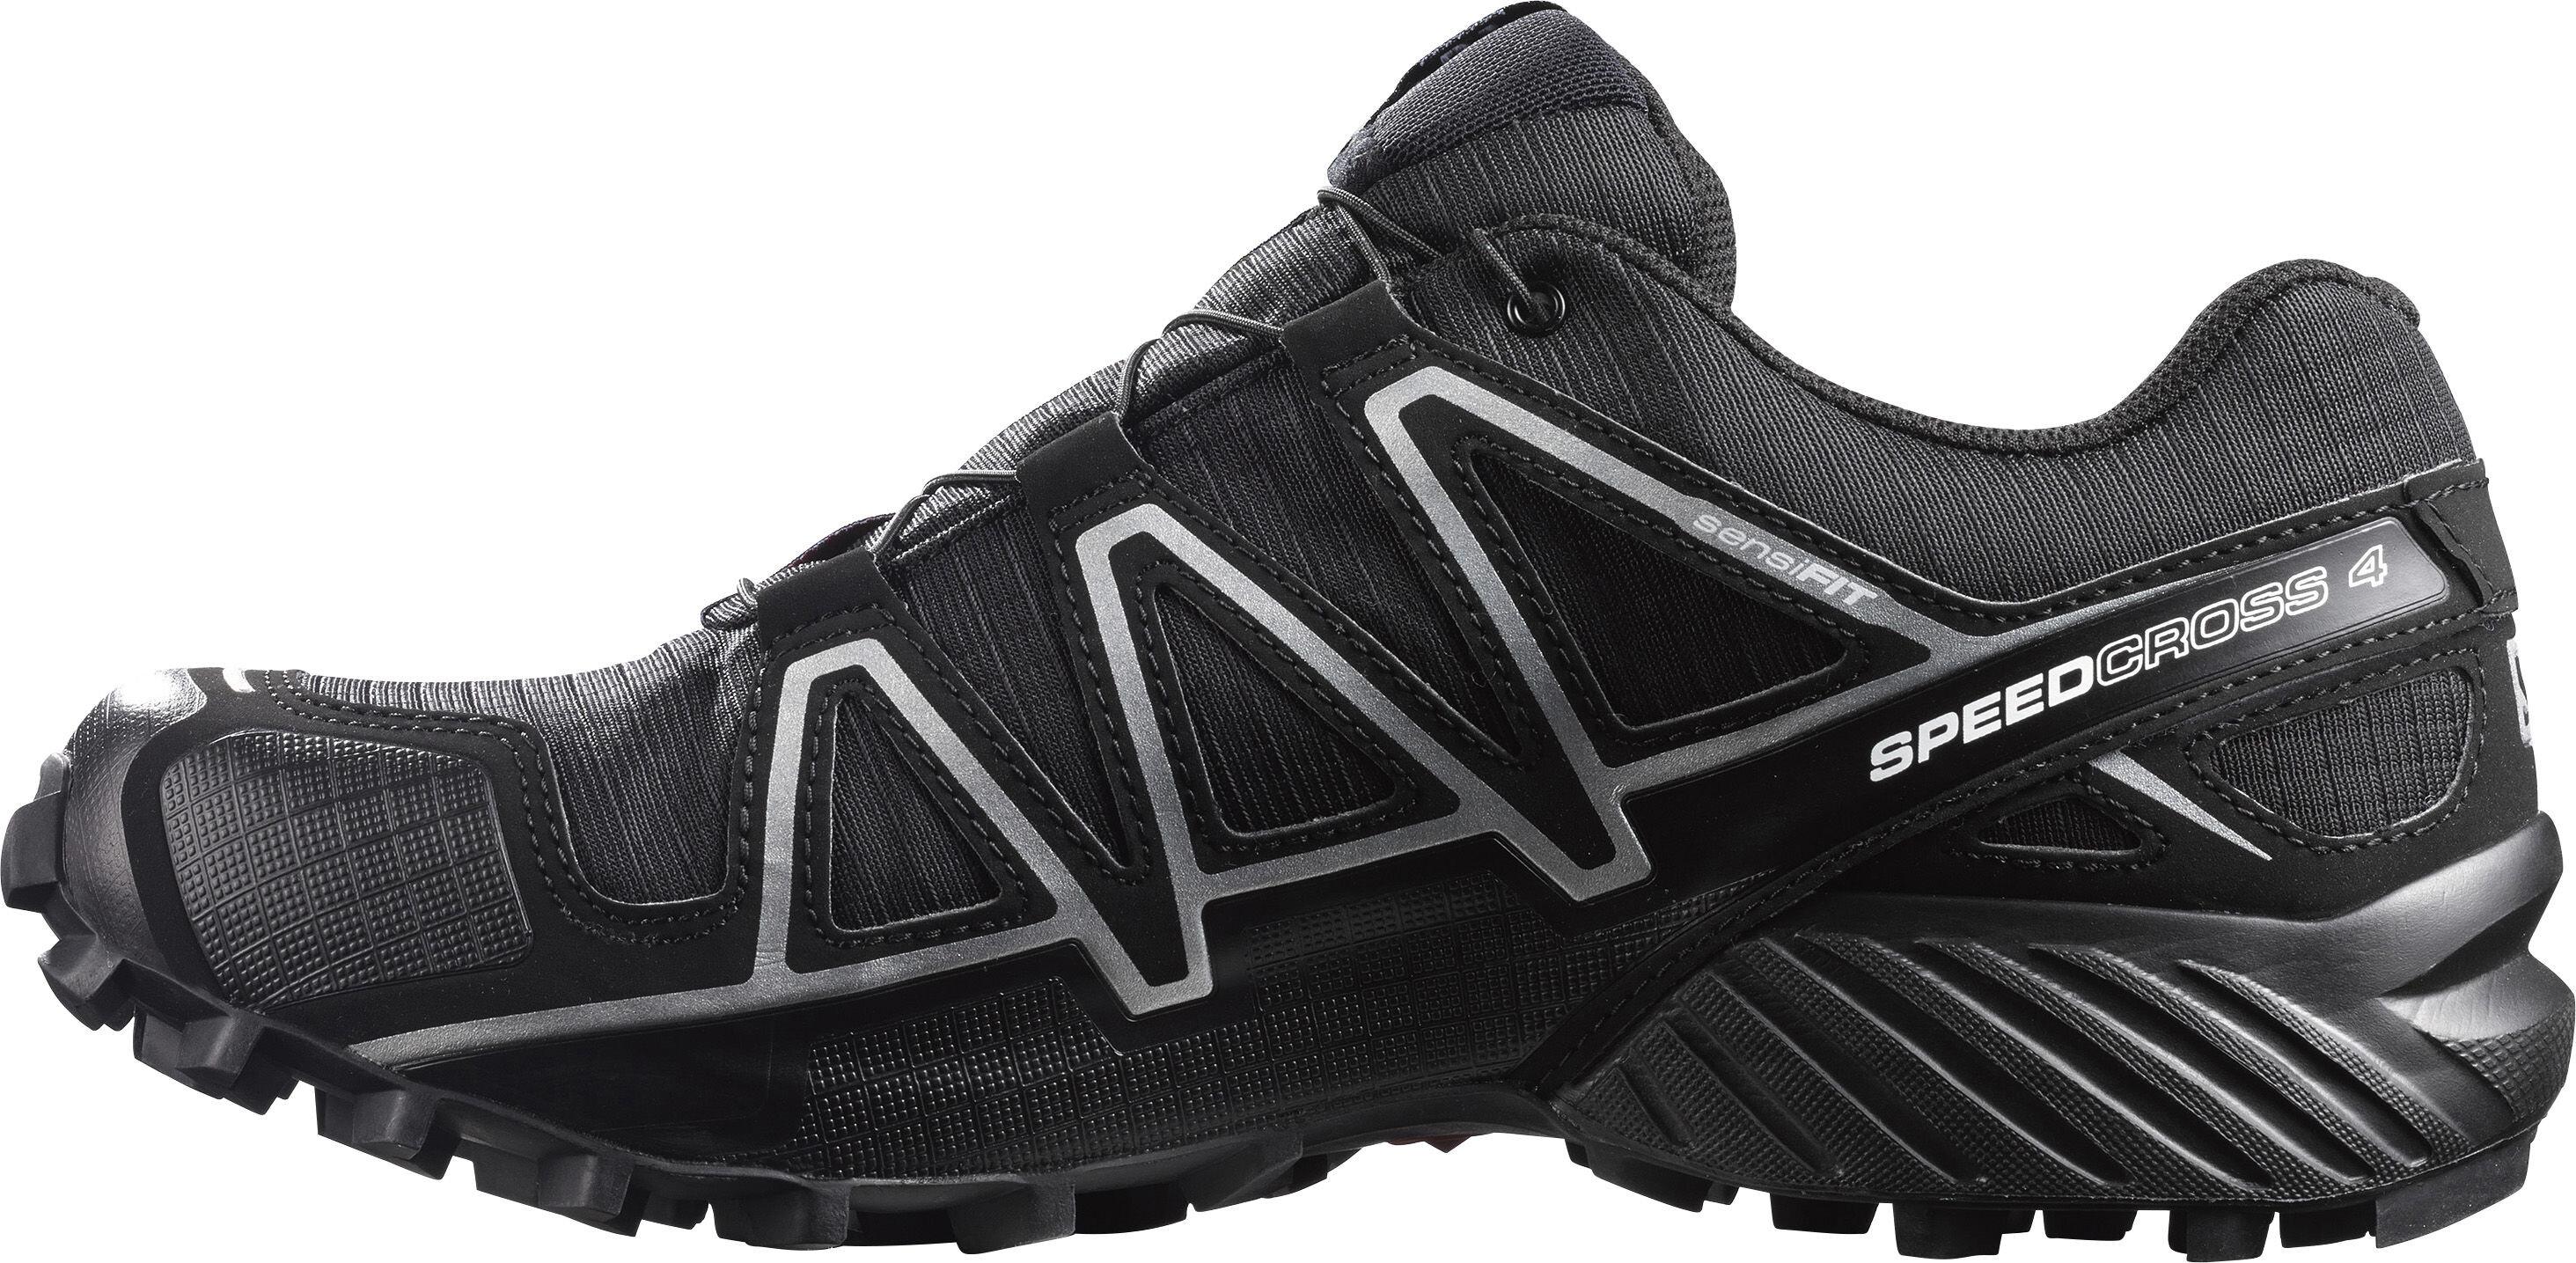 économiser a3779 b7d29 Salomon Speedcross 4 GTX Shoes Men black/black/silver metallic-x